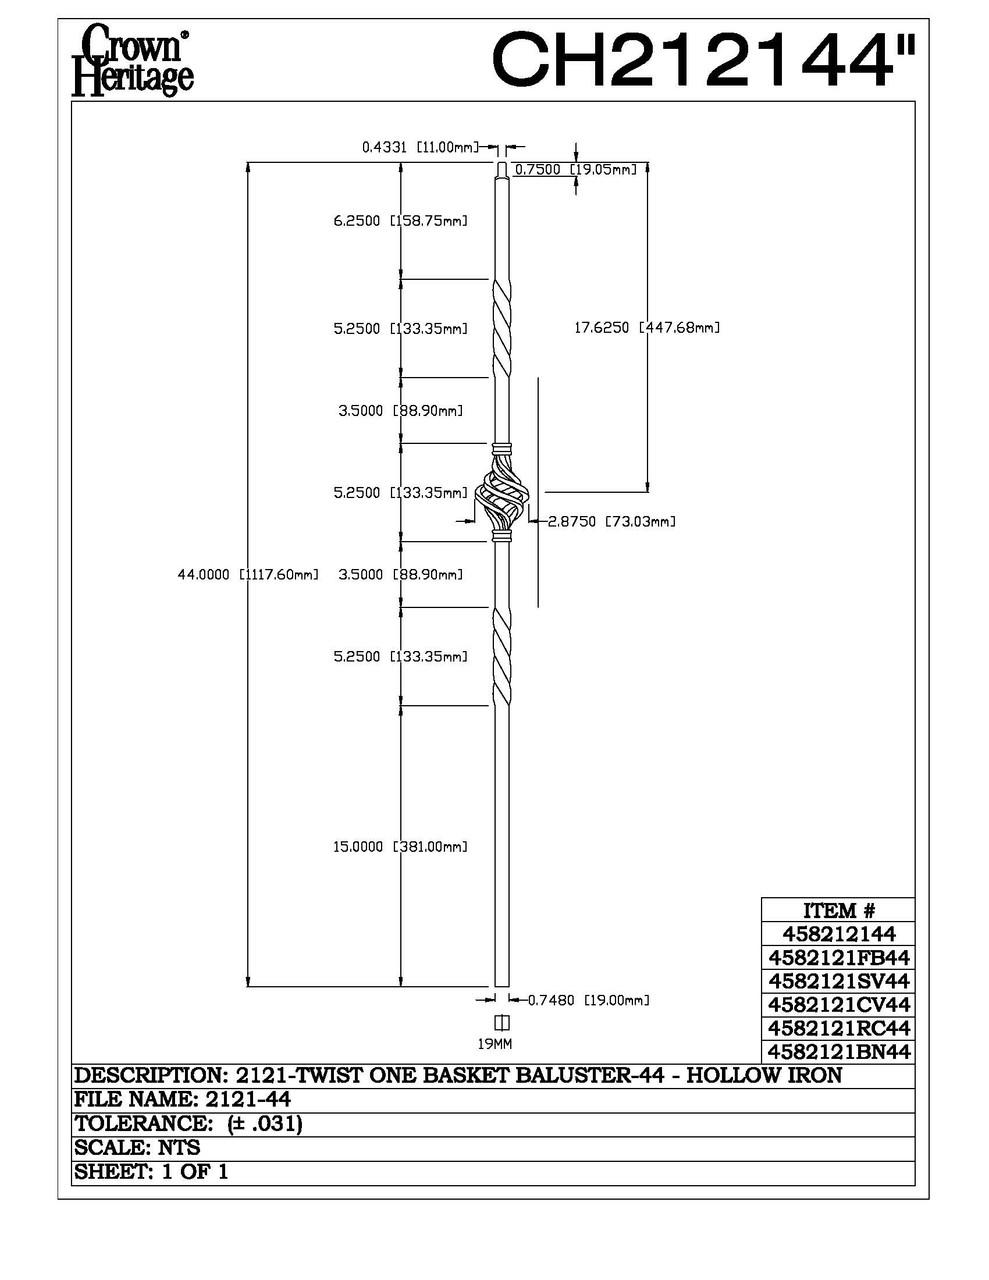 2121 19mm Single Basket Large Hollow Baluster, CADD DRAWING